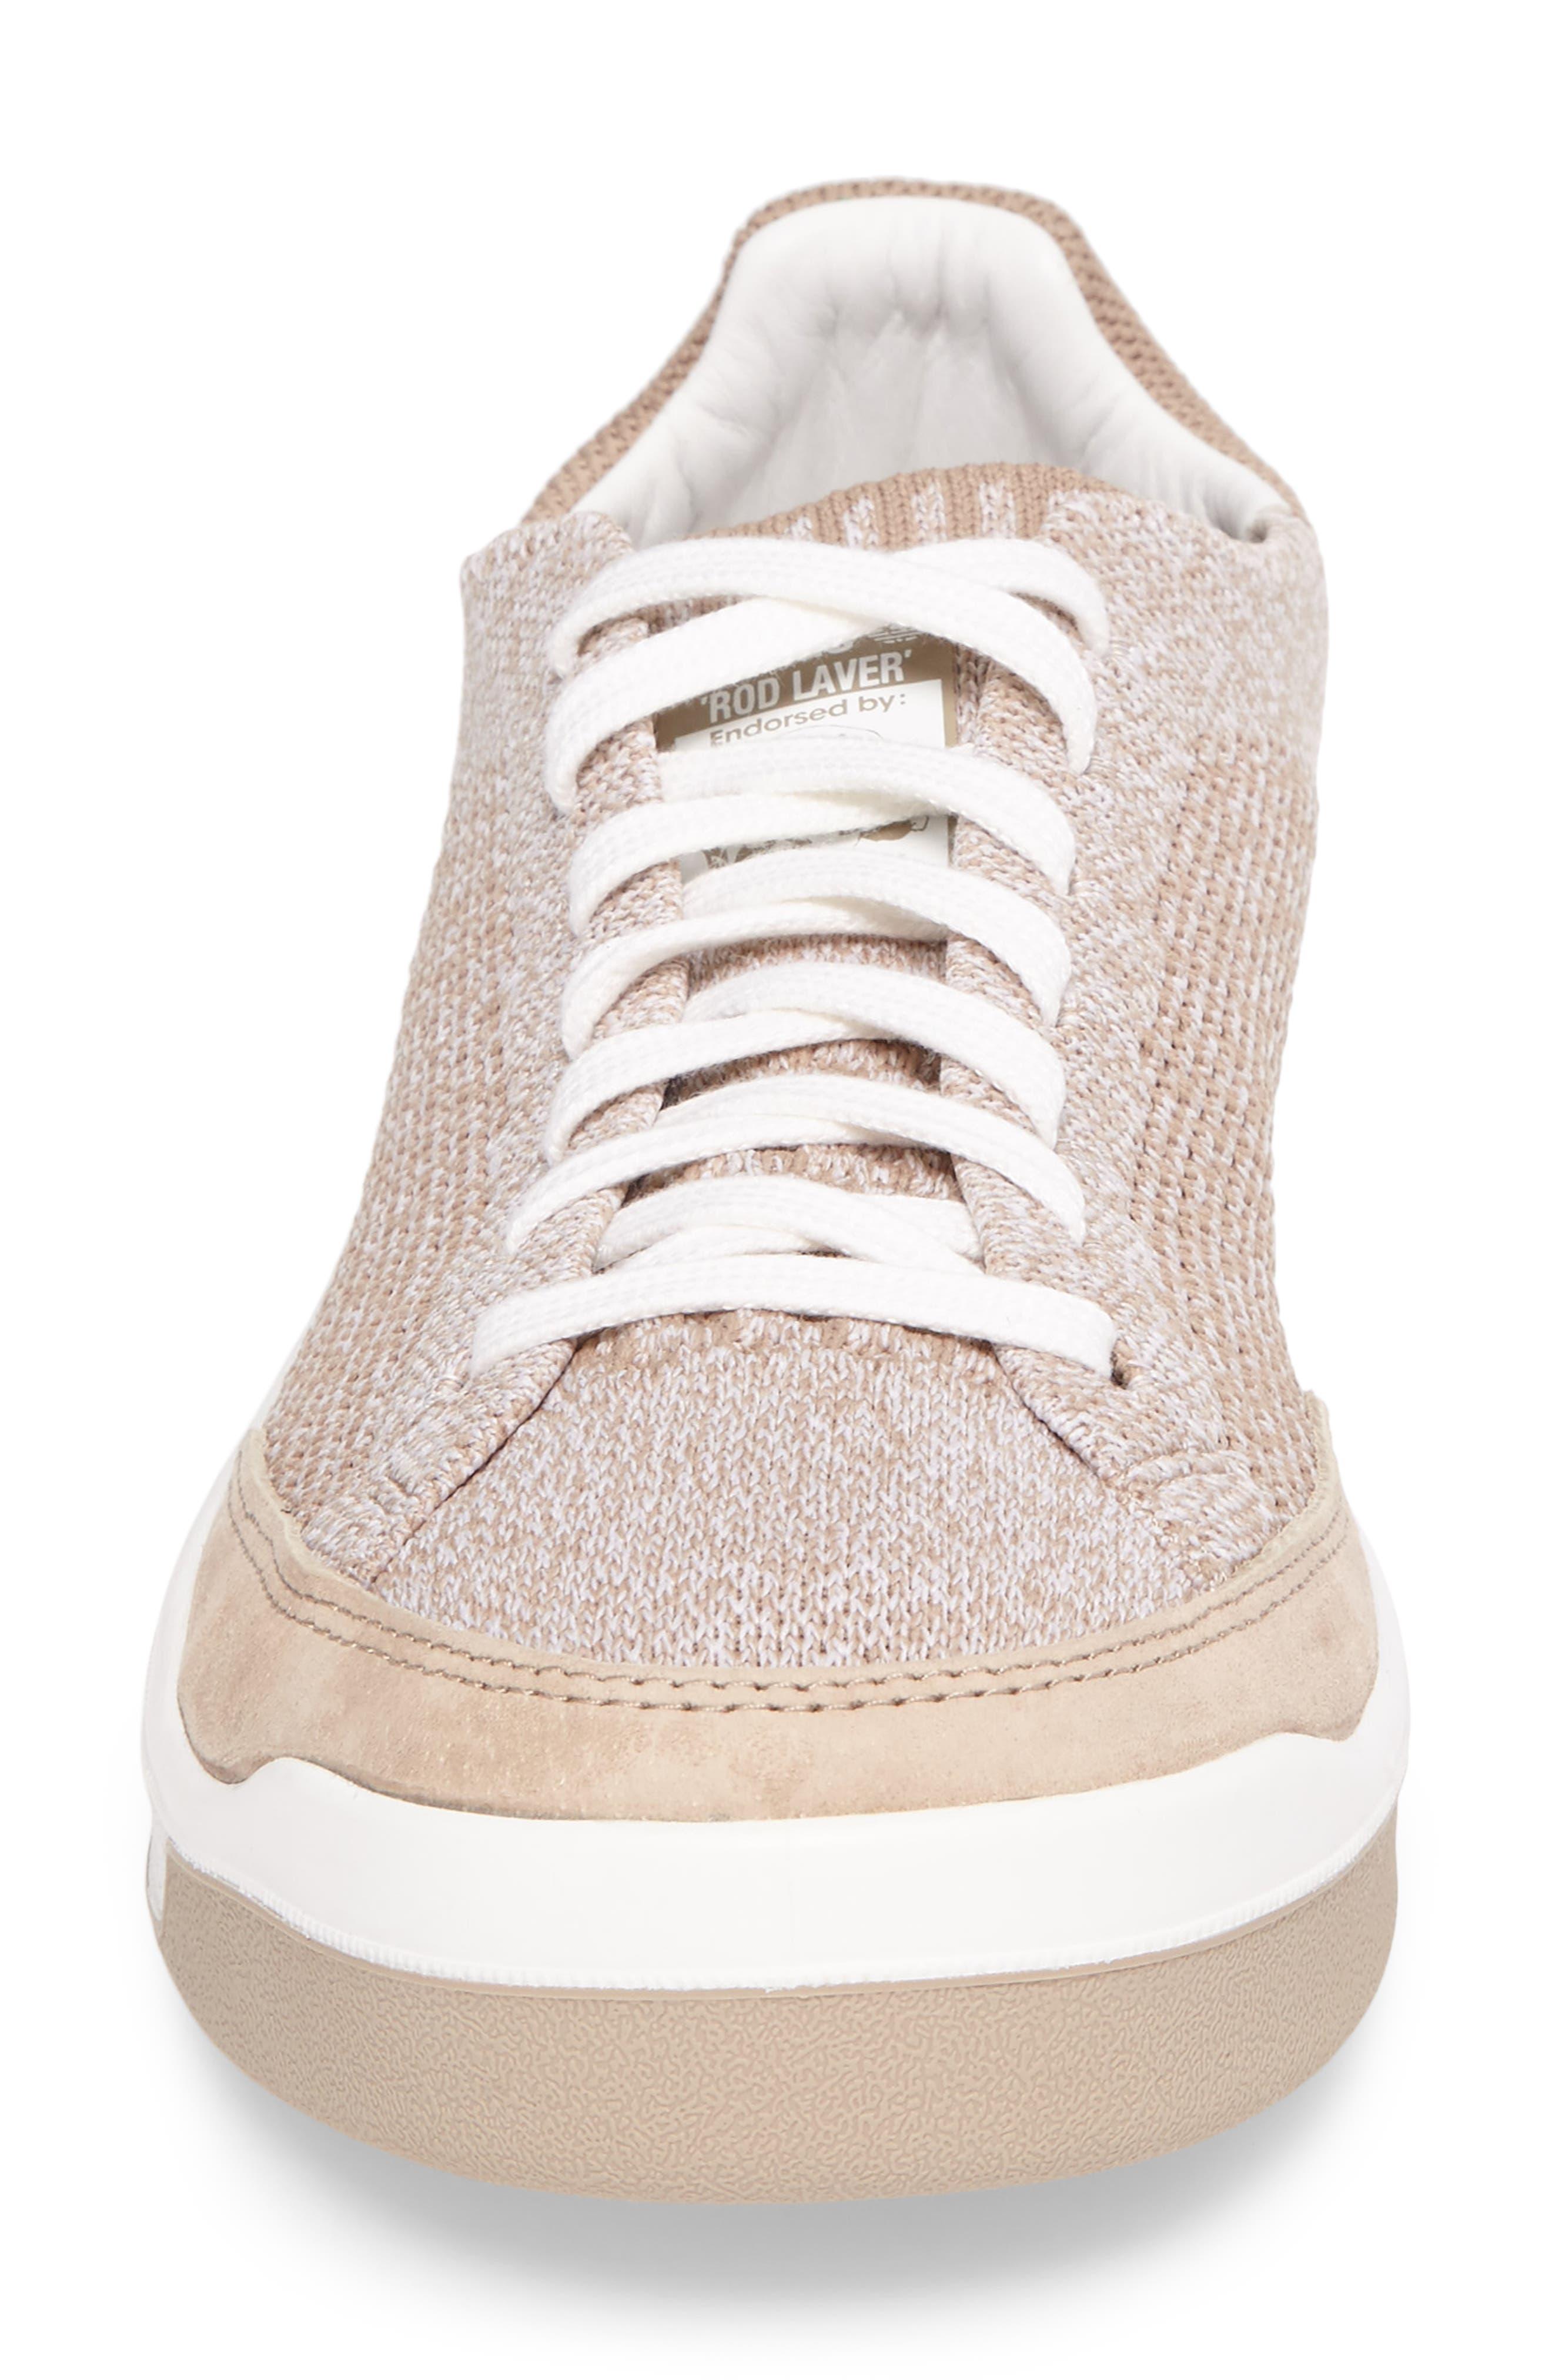 Rod Laver Super Primeknit Sneaker,                             Alternate thumbnail 8, color,